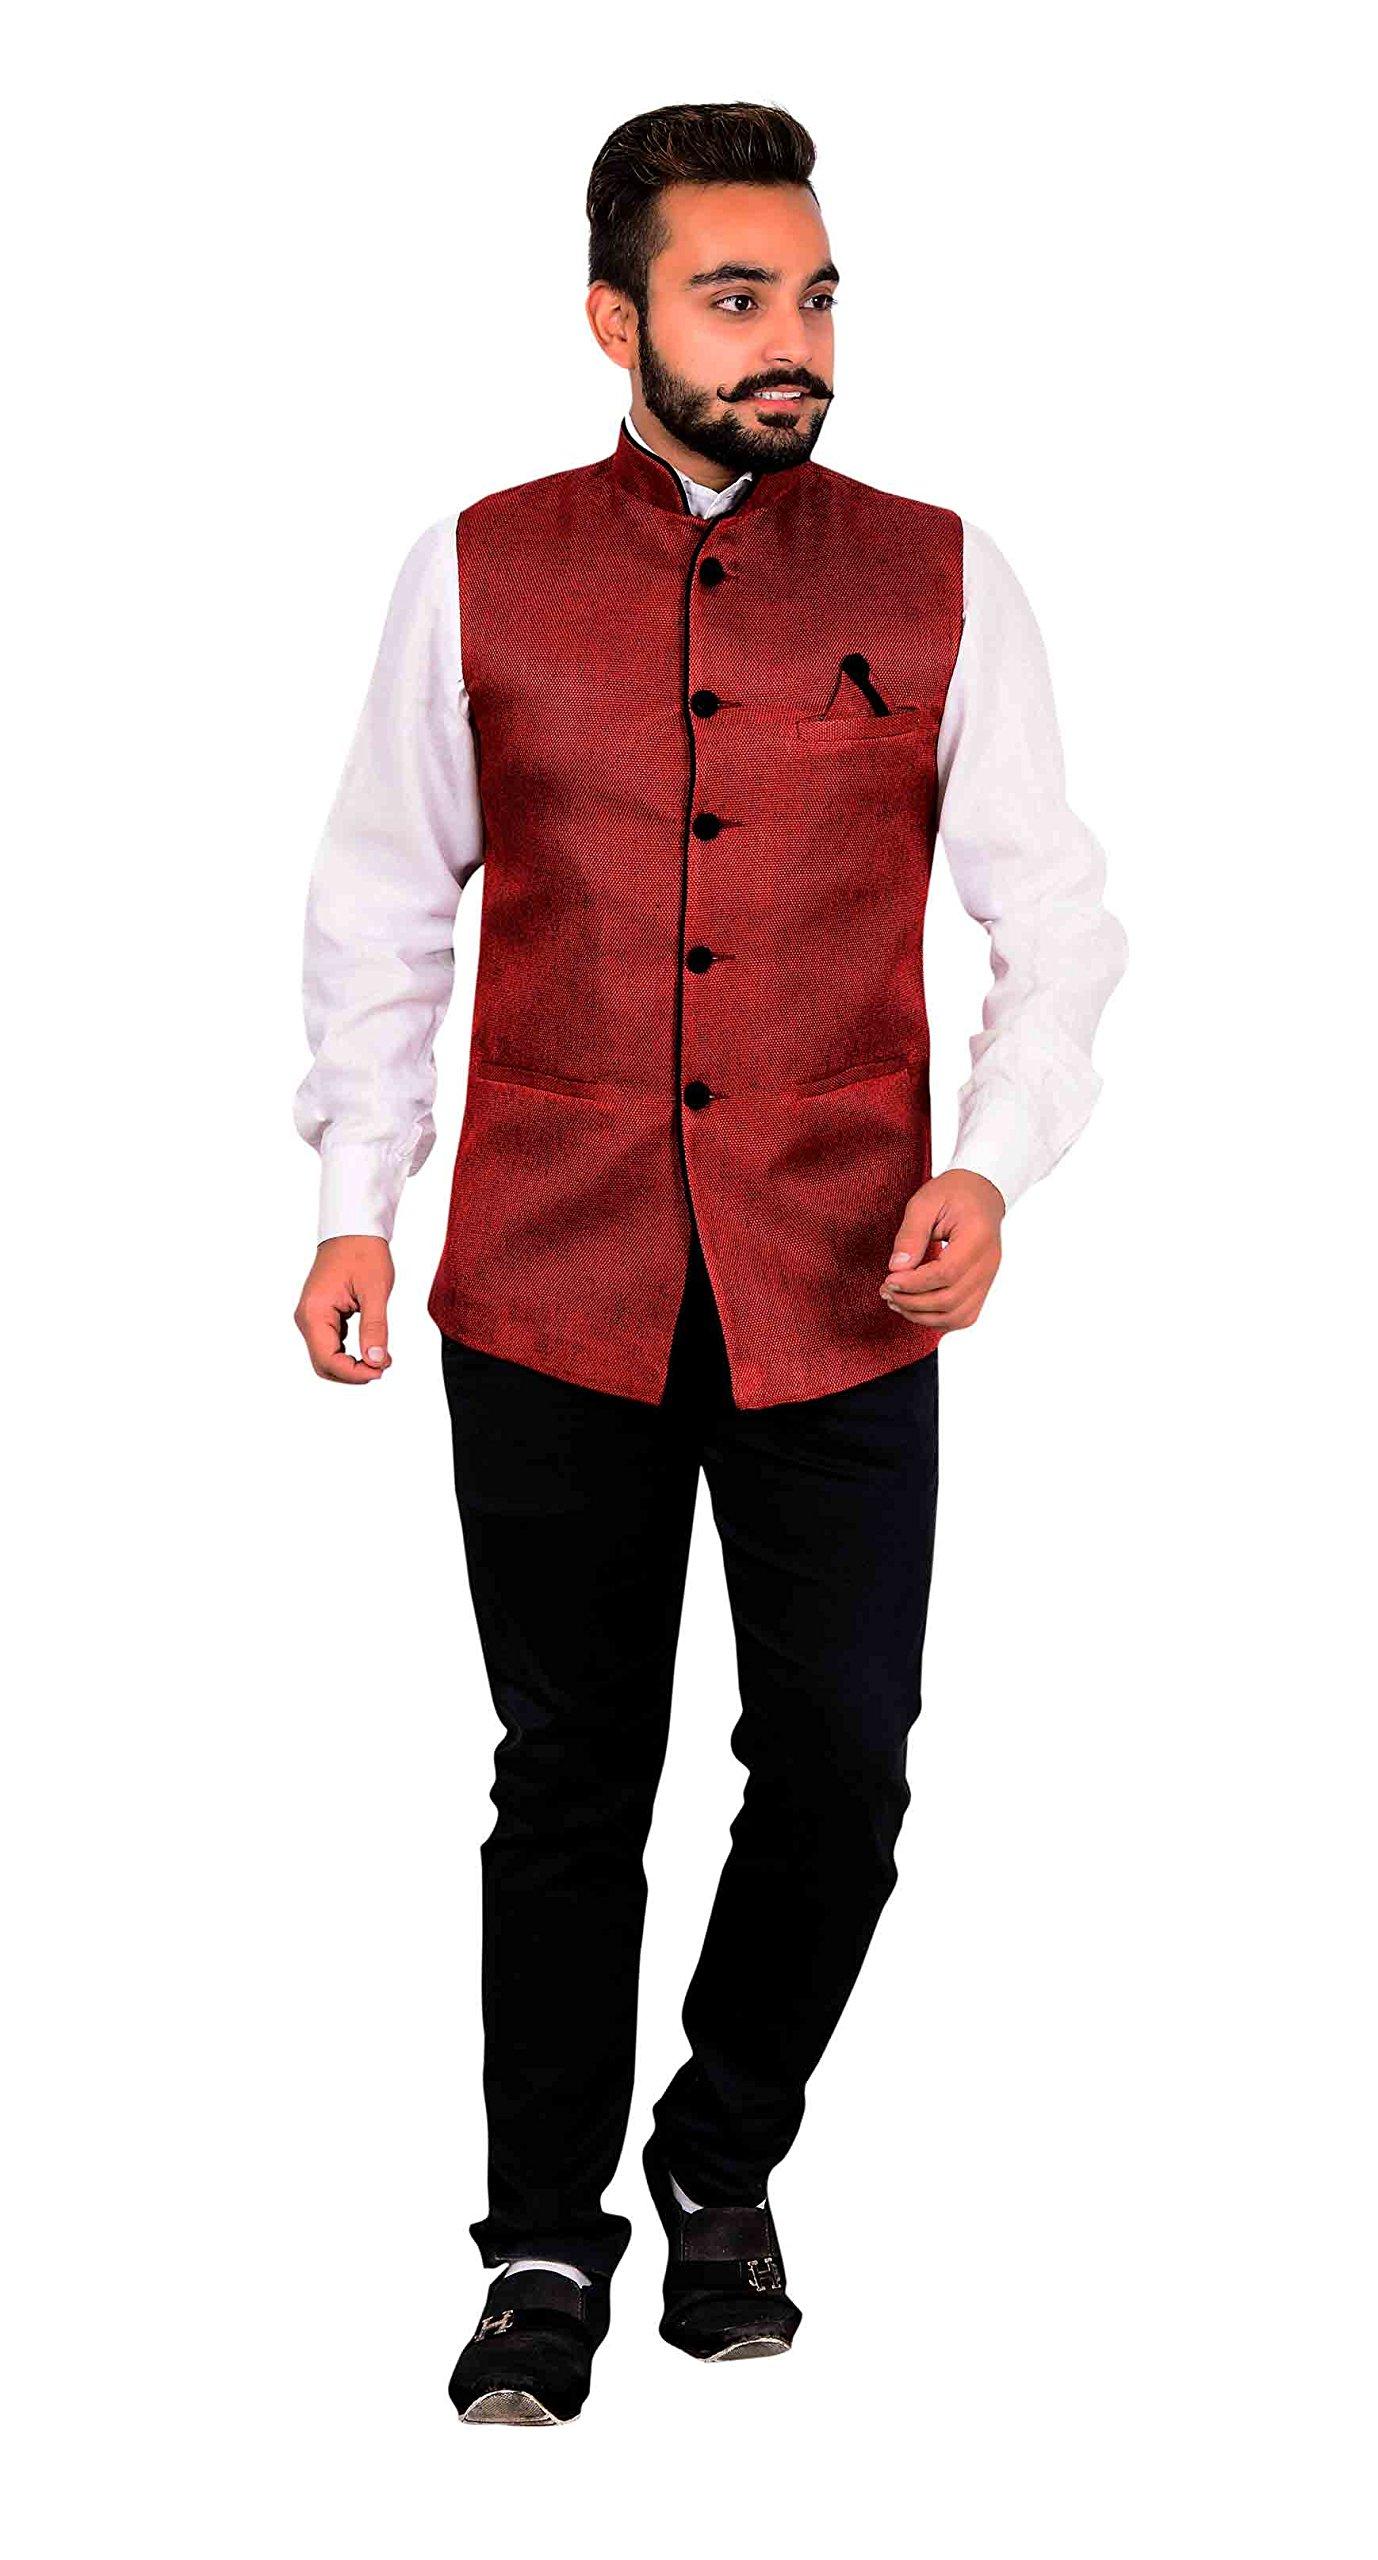 Men's Modi style Waistcoat for shalwar kameez for Indian Bollywood theme & wedding party London 1003 (36 (XS), Maroon)